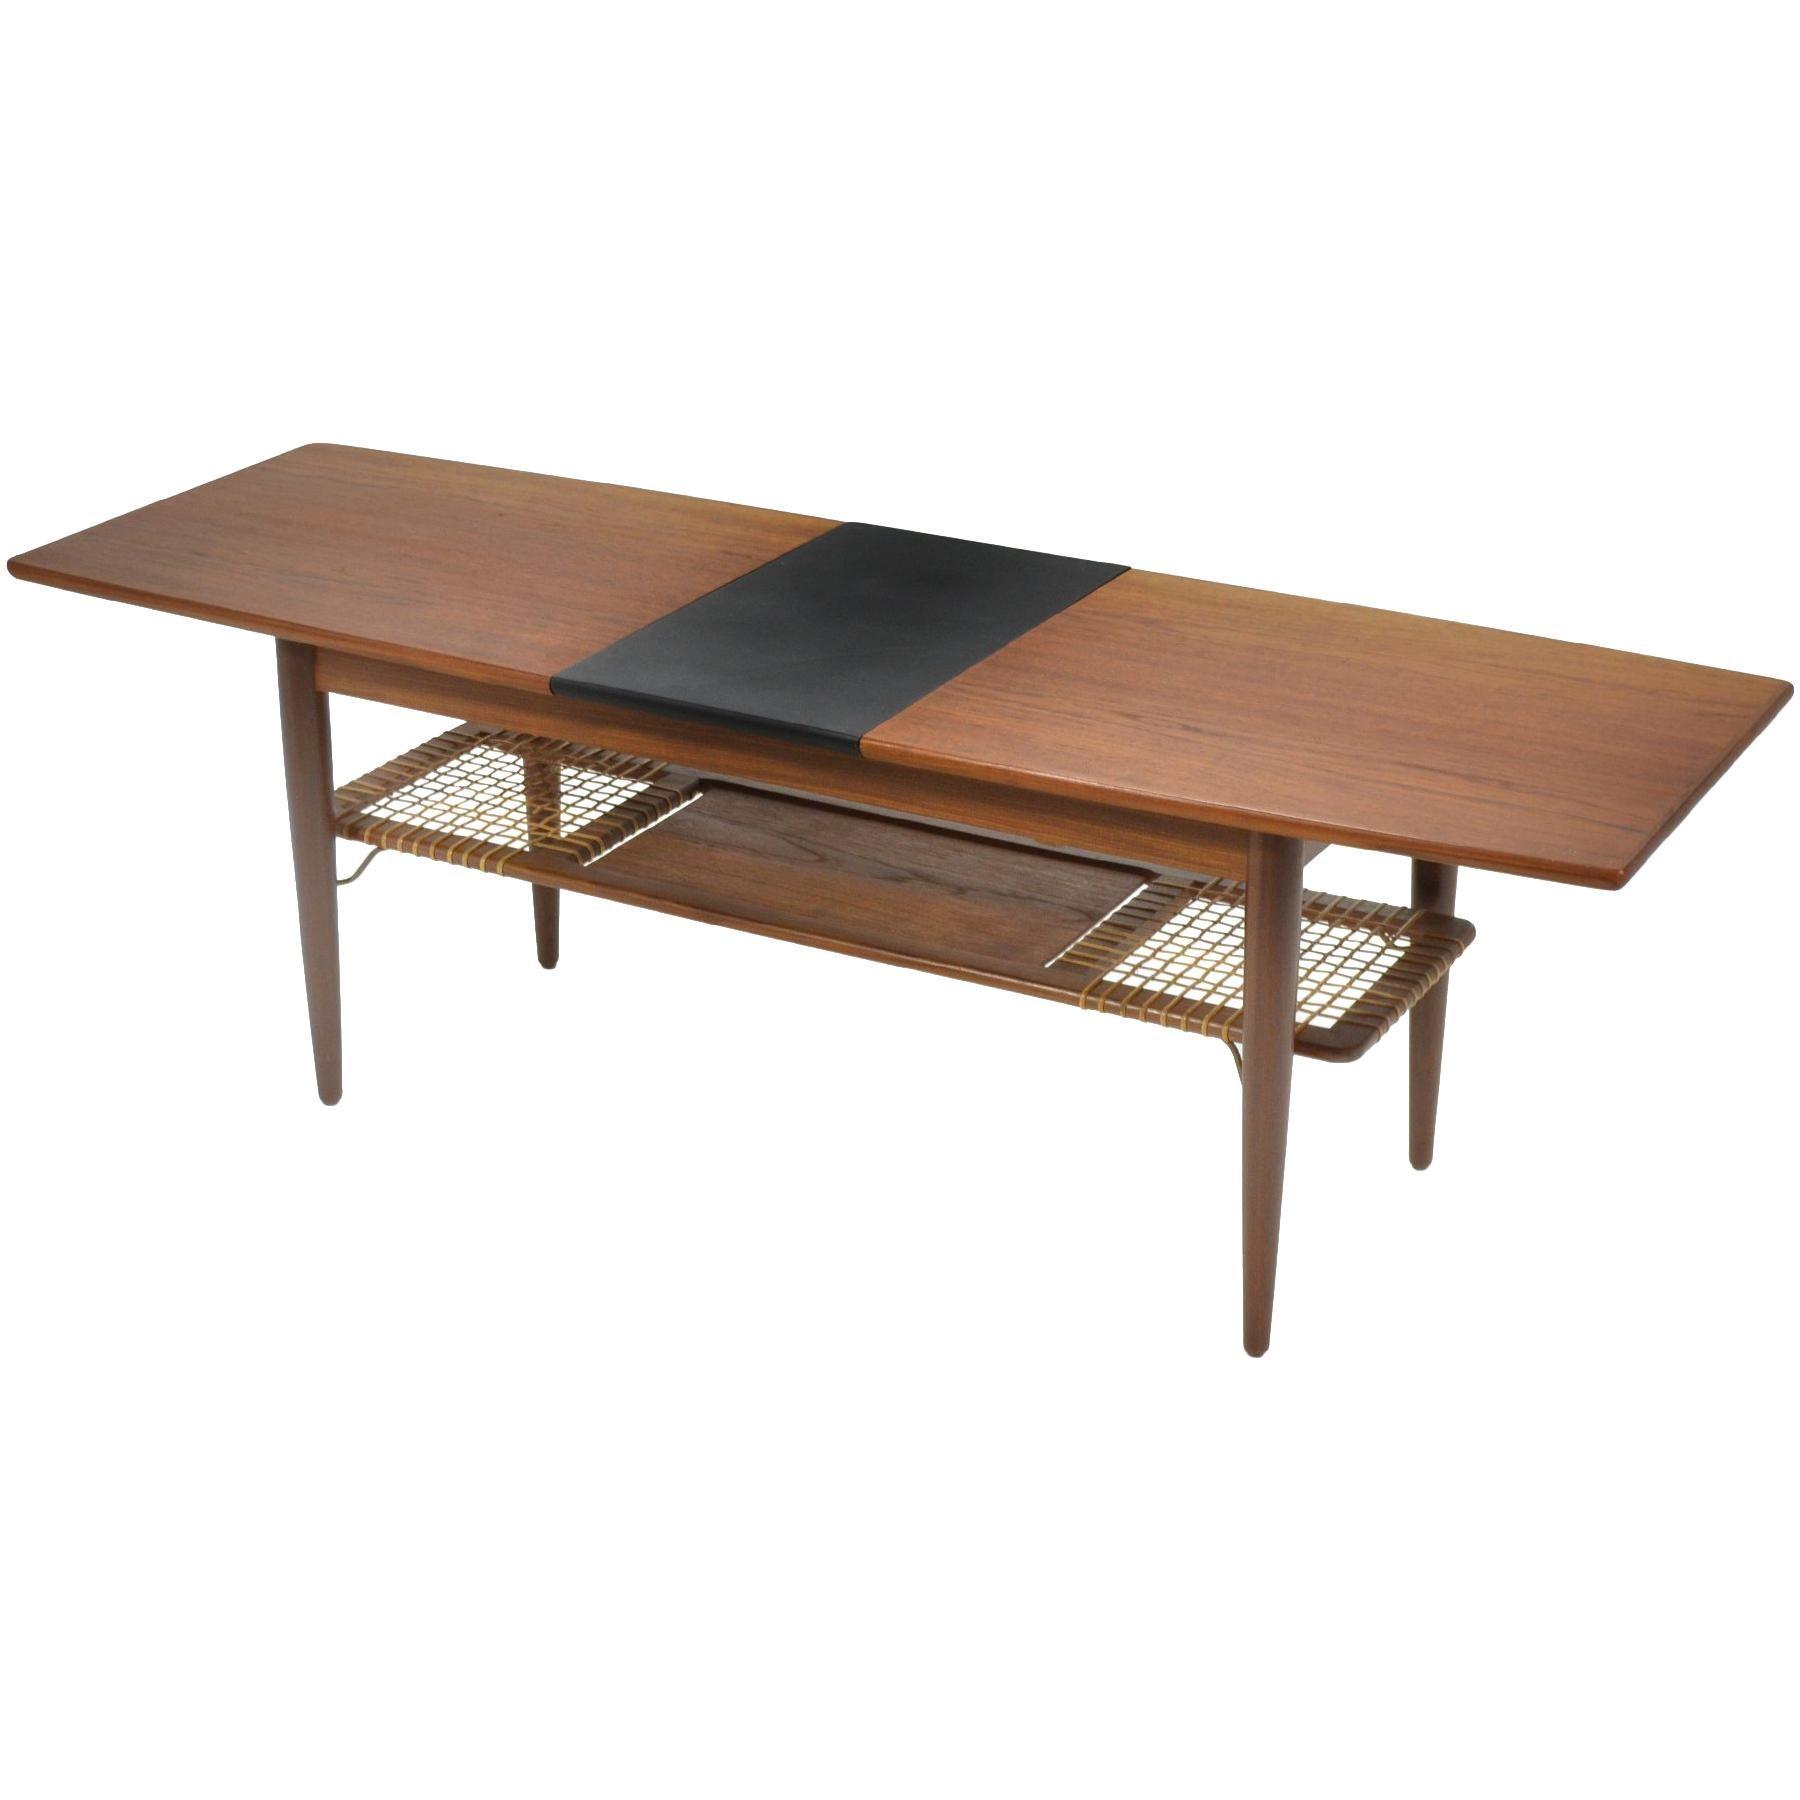 Danish Teak Extension Coffee Table